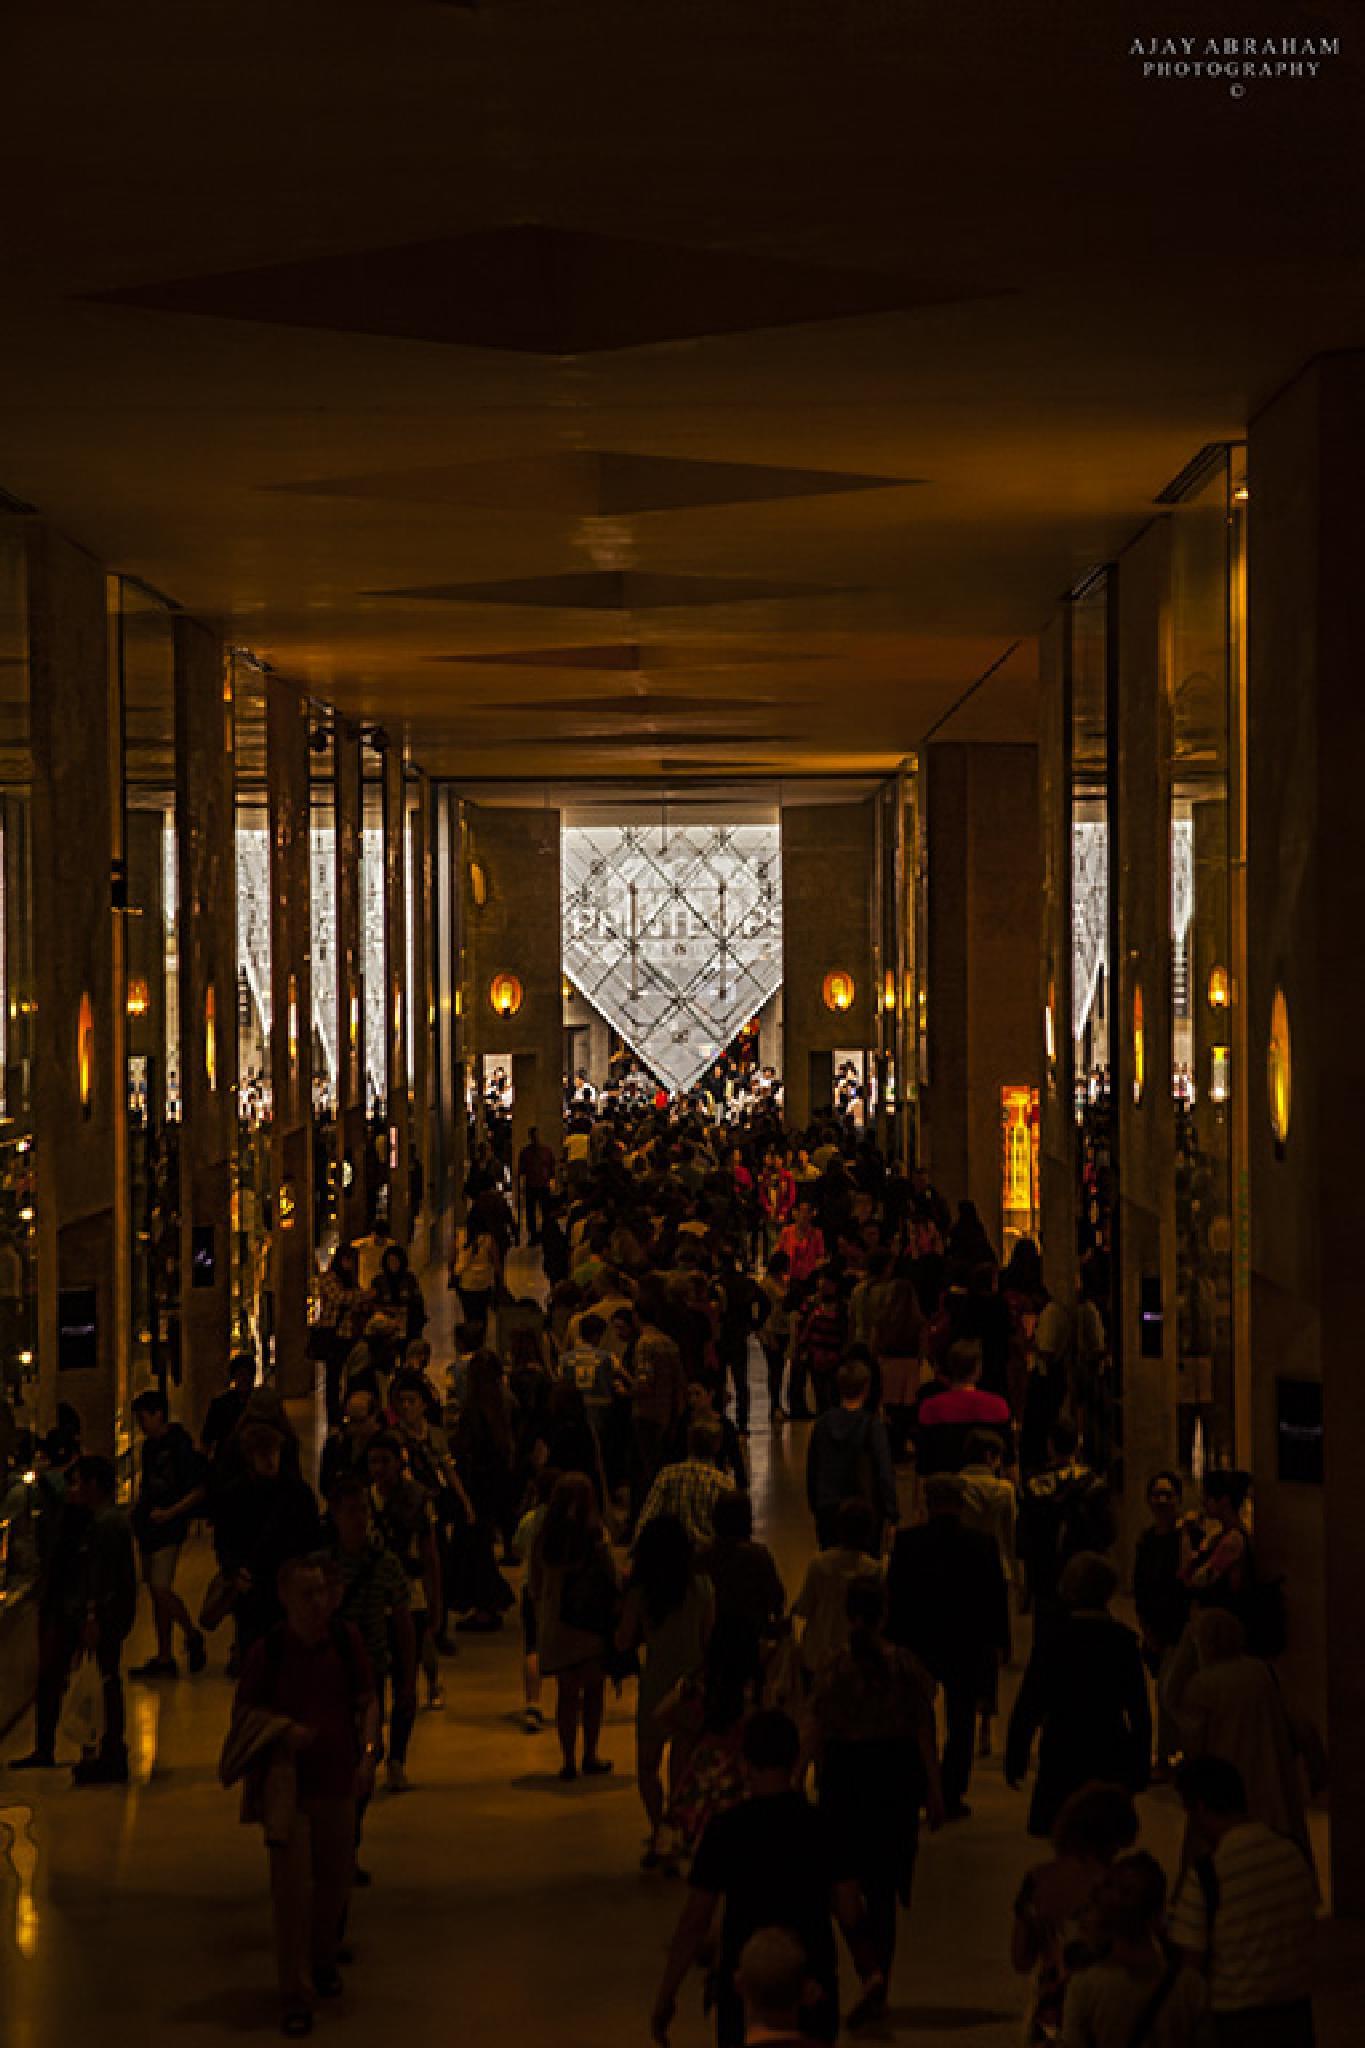 Louvre by ajayabraham2